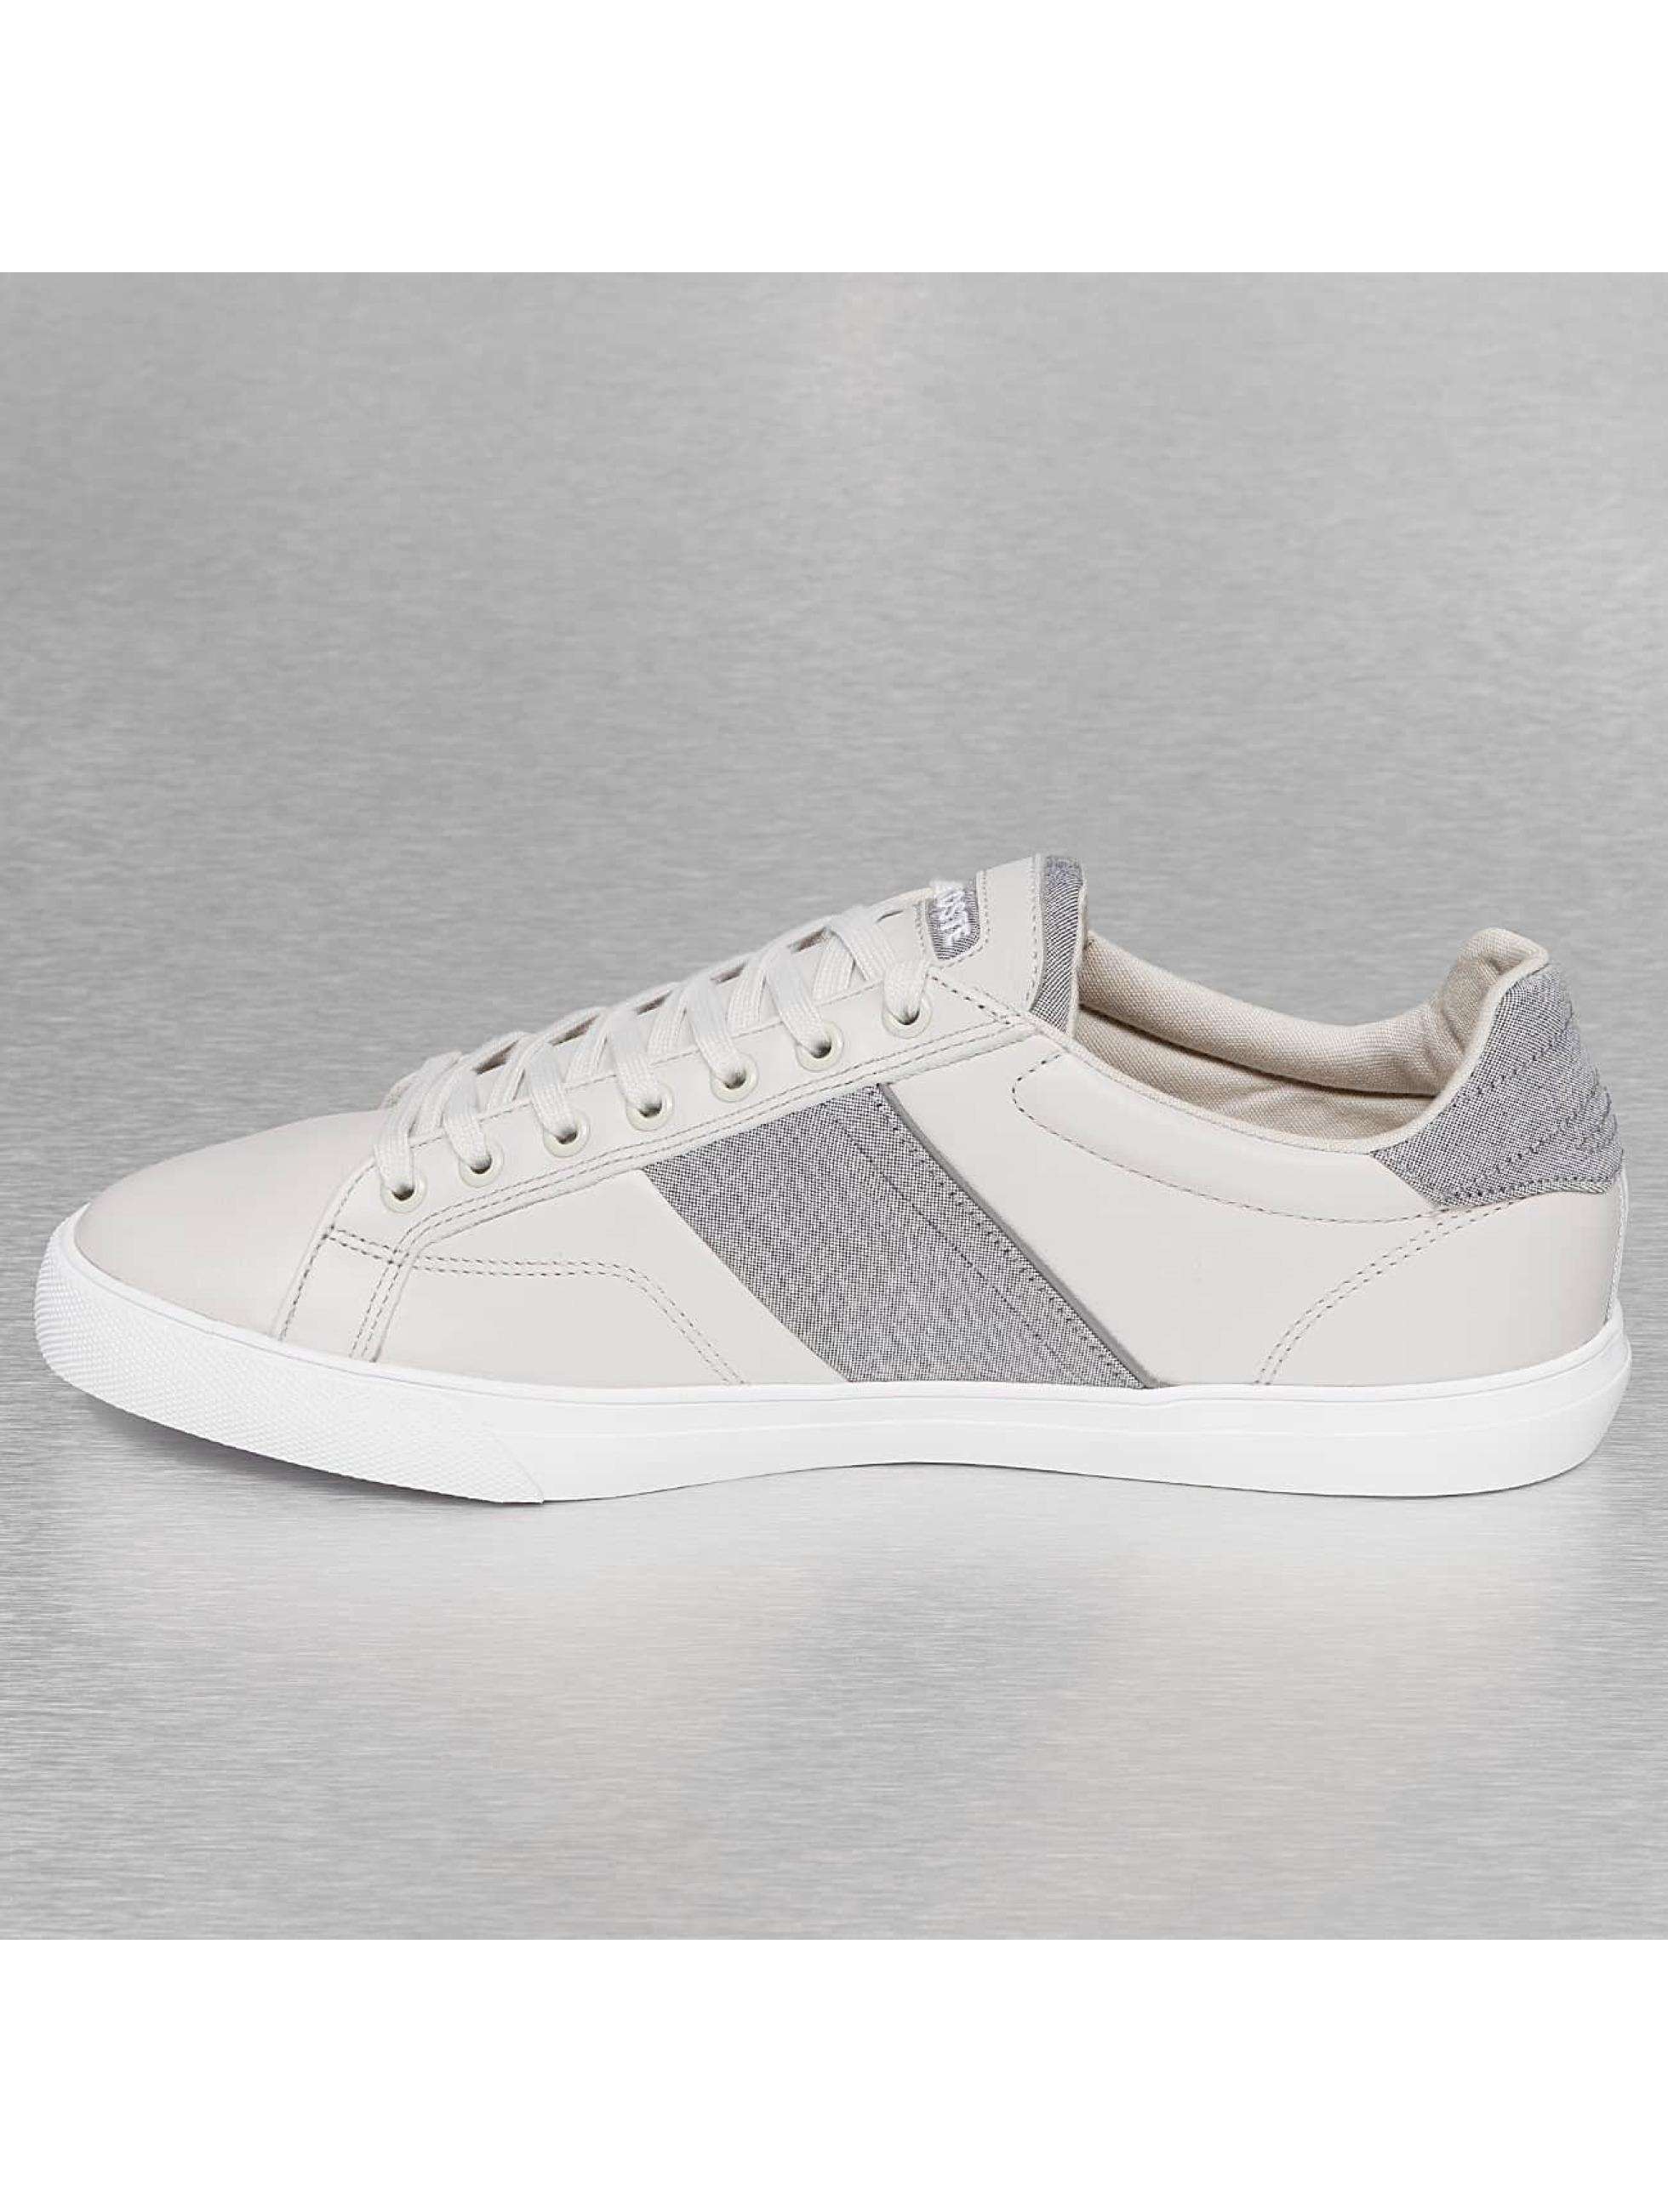 Lacoste Sneaker Fairlead 216 1 SPM grau